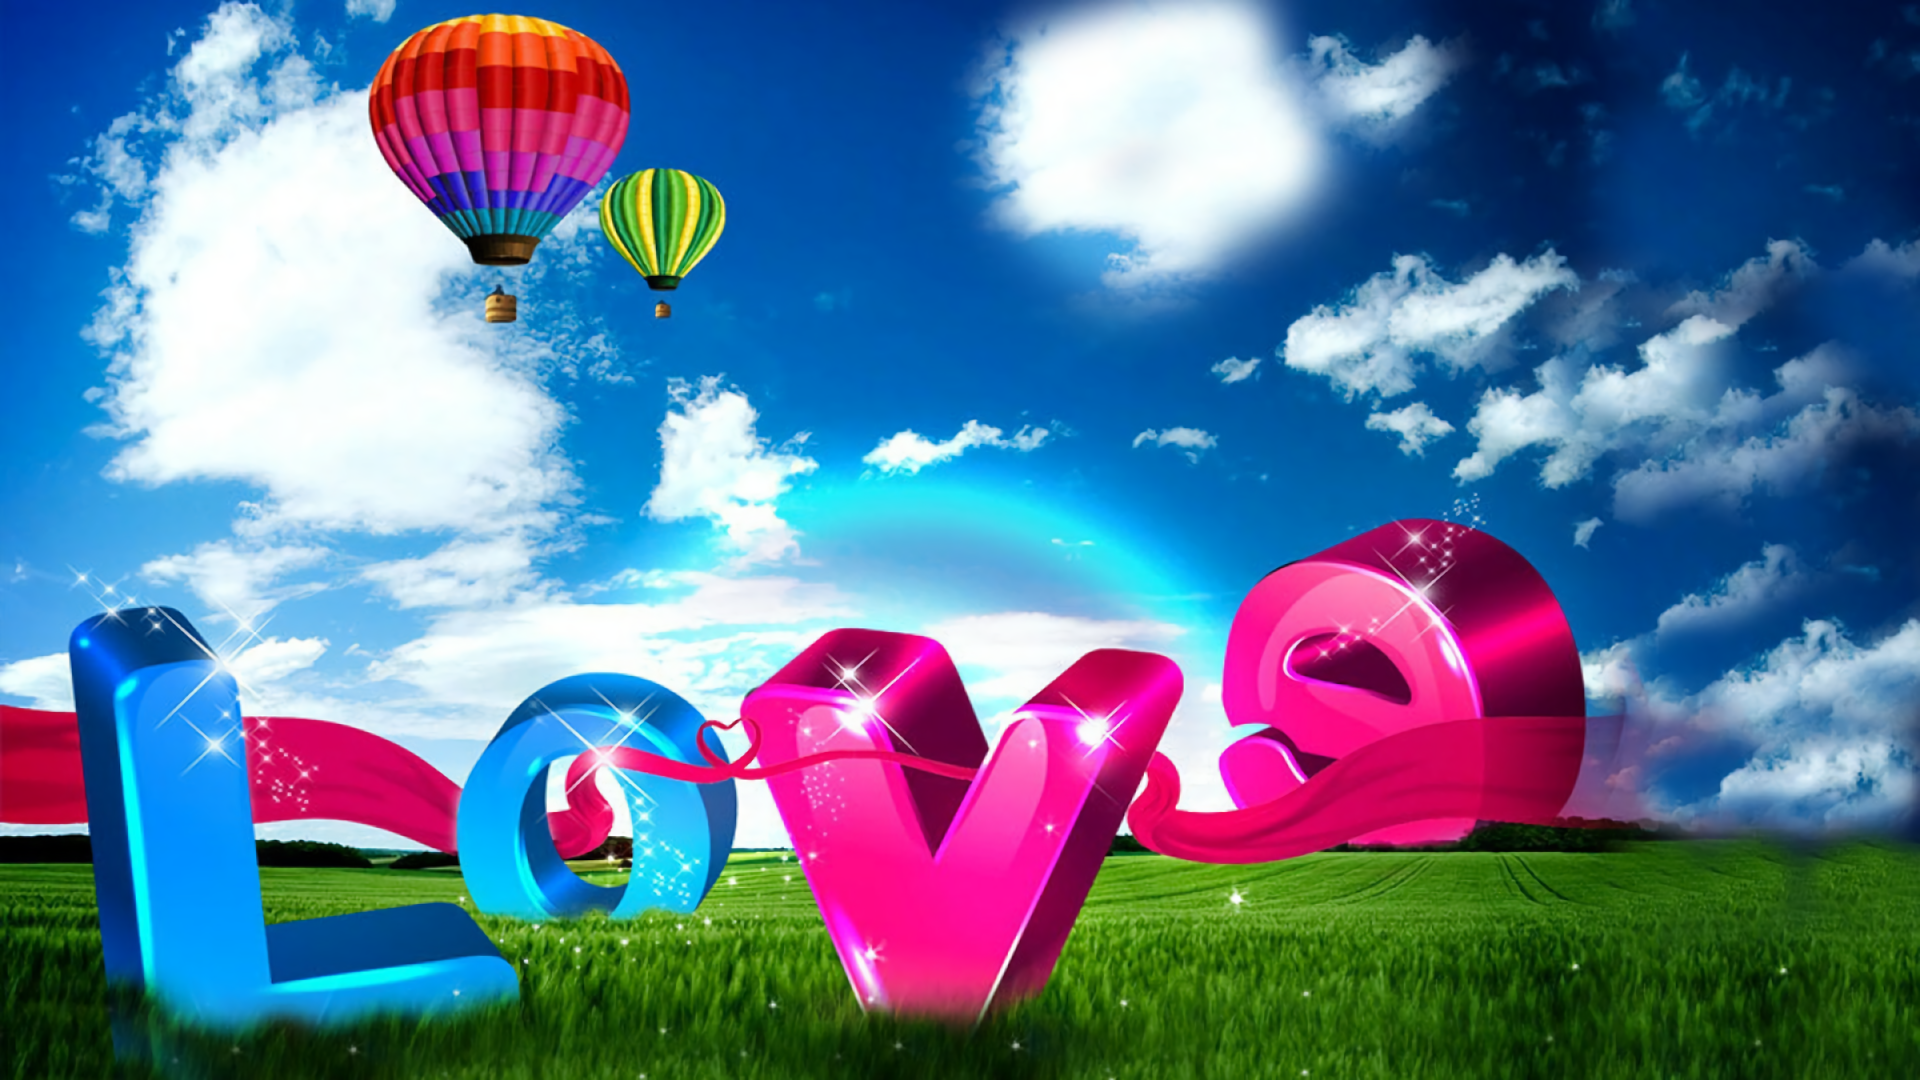 Artistic - Love  Artistic Colorful Meadow Hot Air Balloon Wallpaper